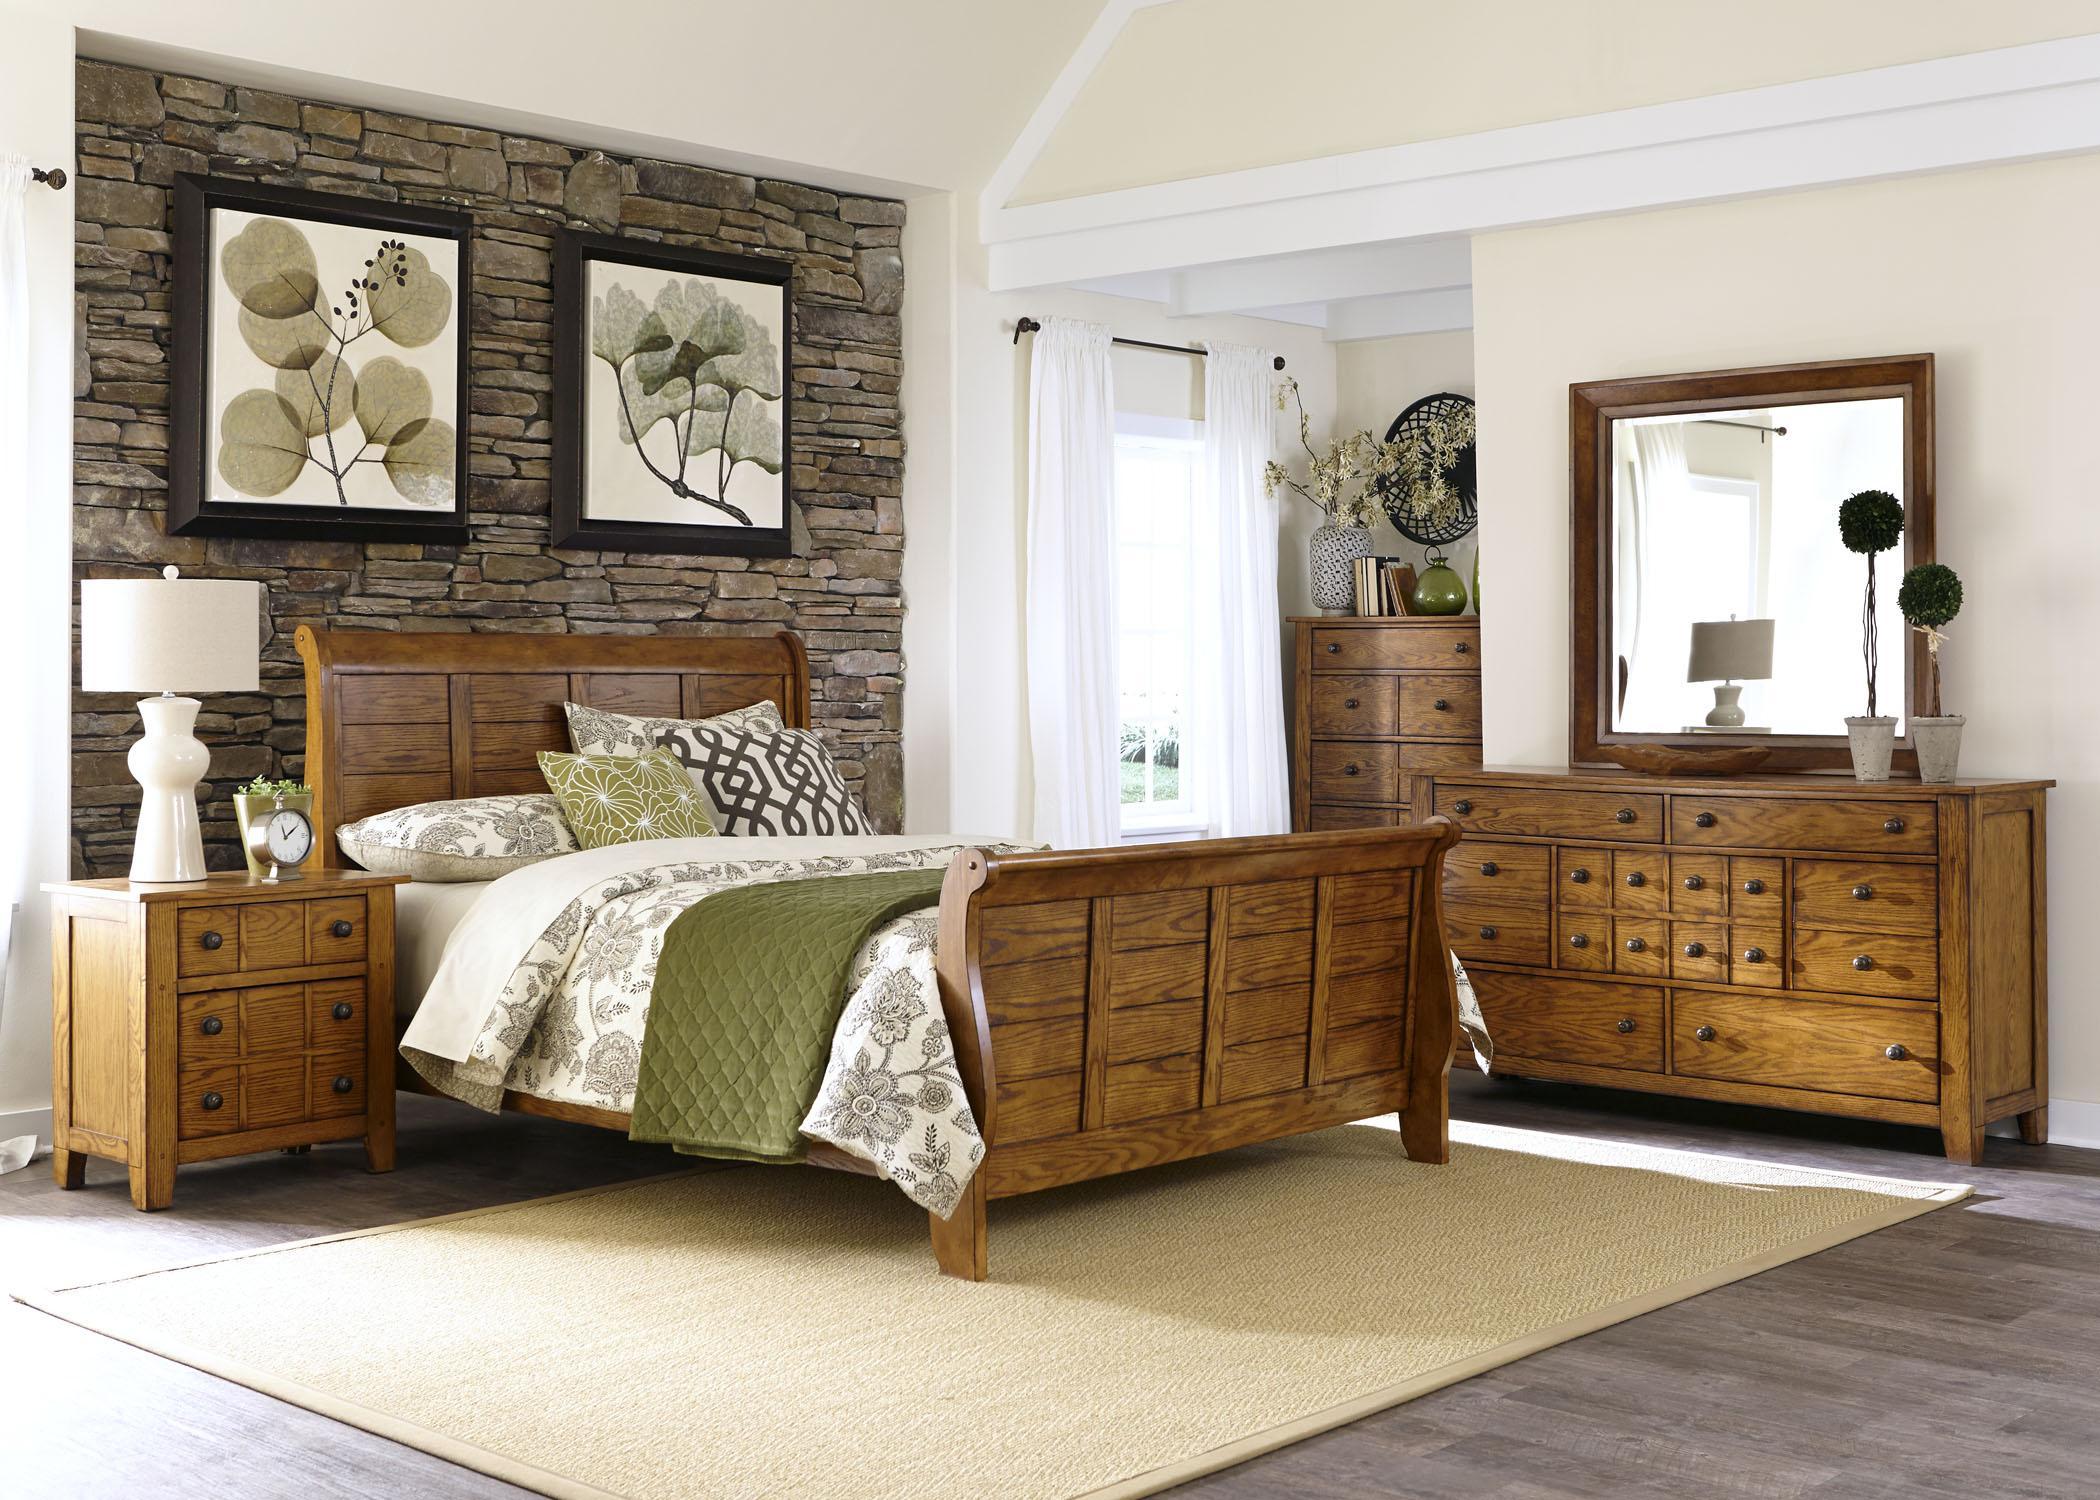 liberty furniture grandpa 39 s cabin king bedroom group item number